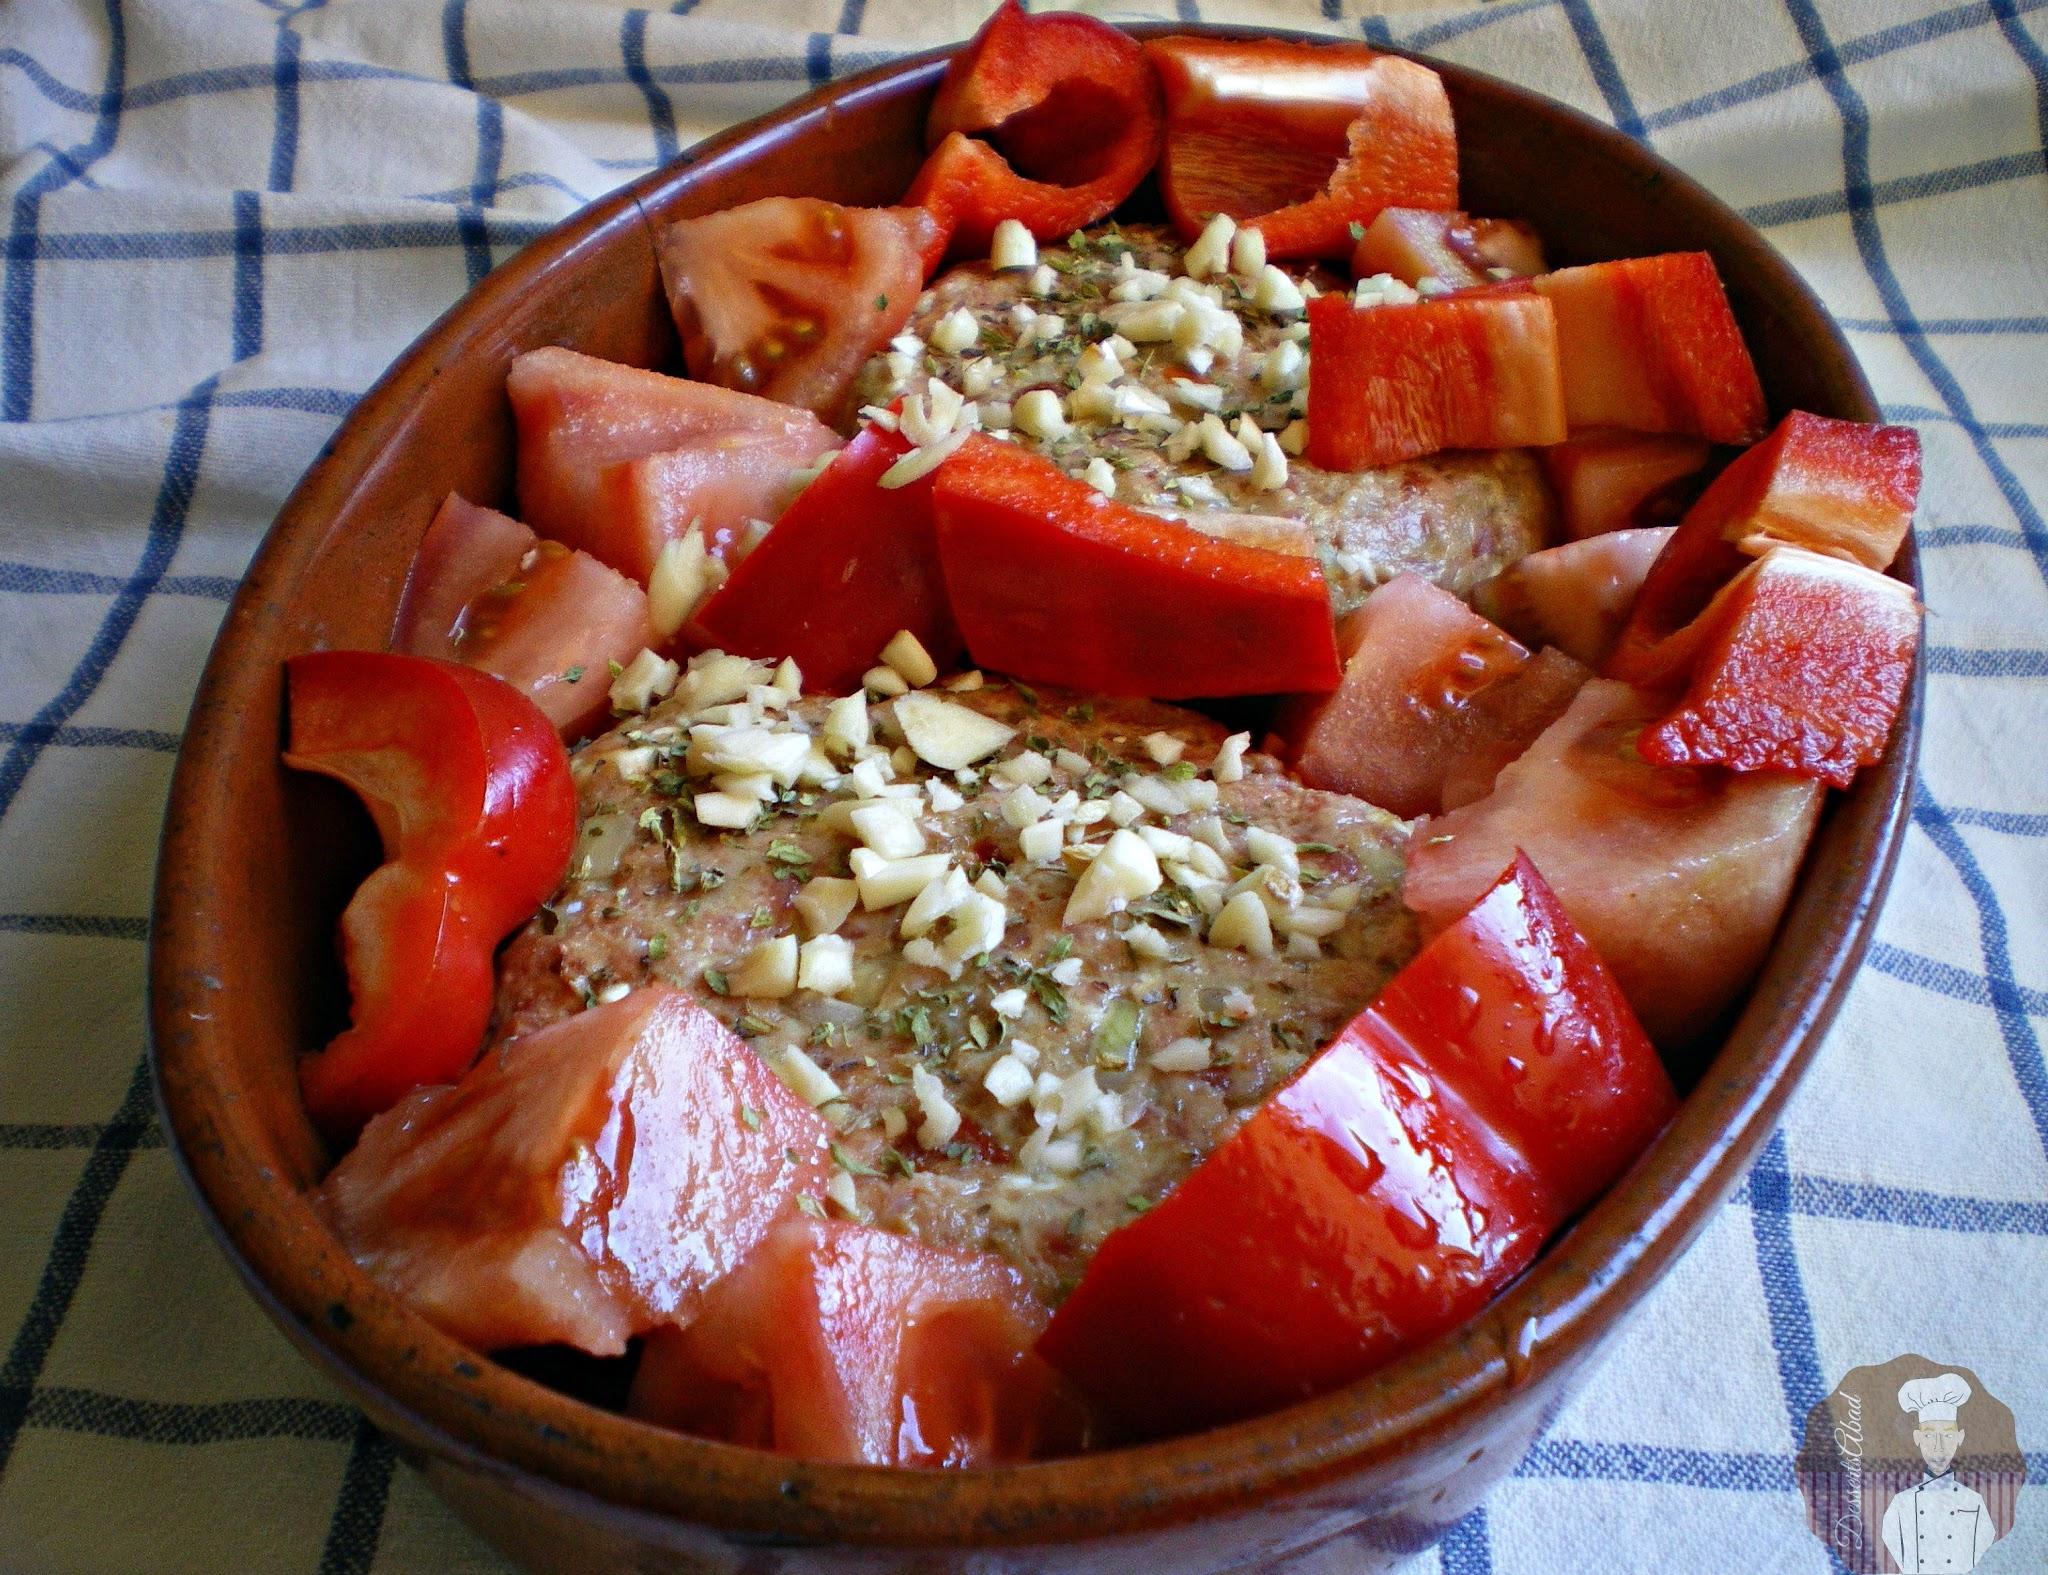 Hamburguesas sabrosas al horno con verduras; Previo horneado